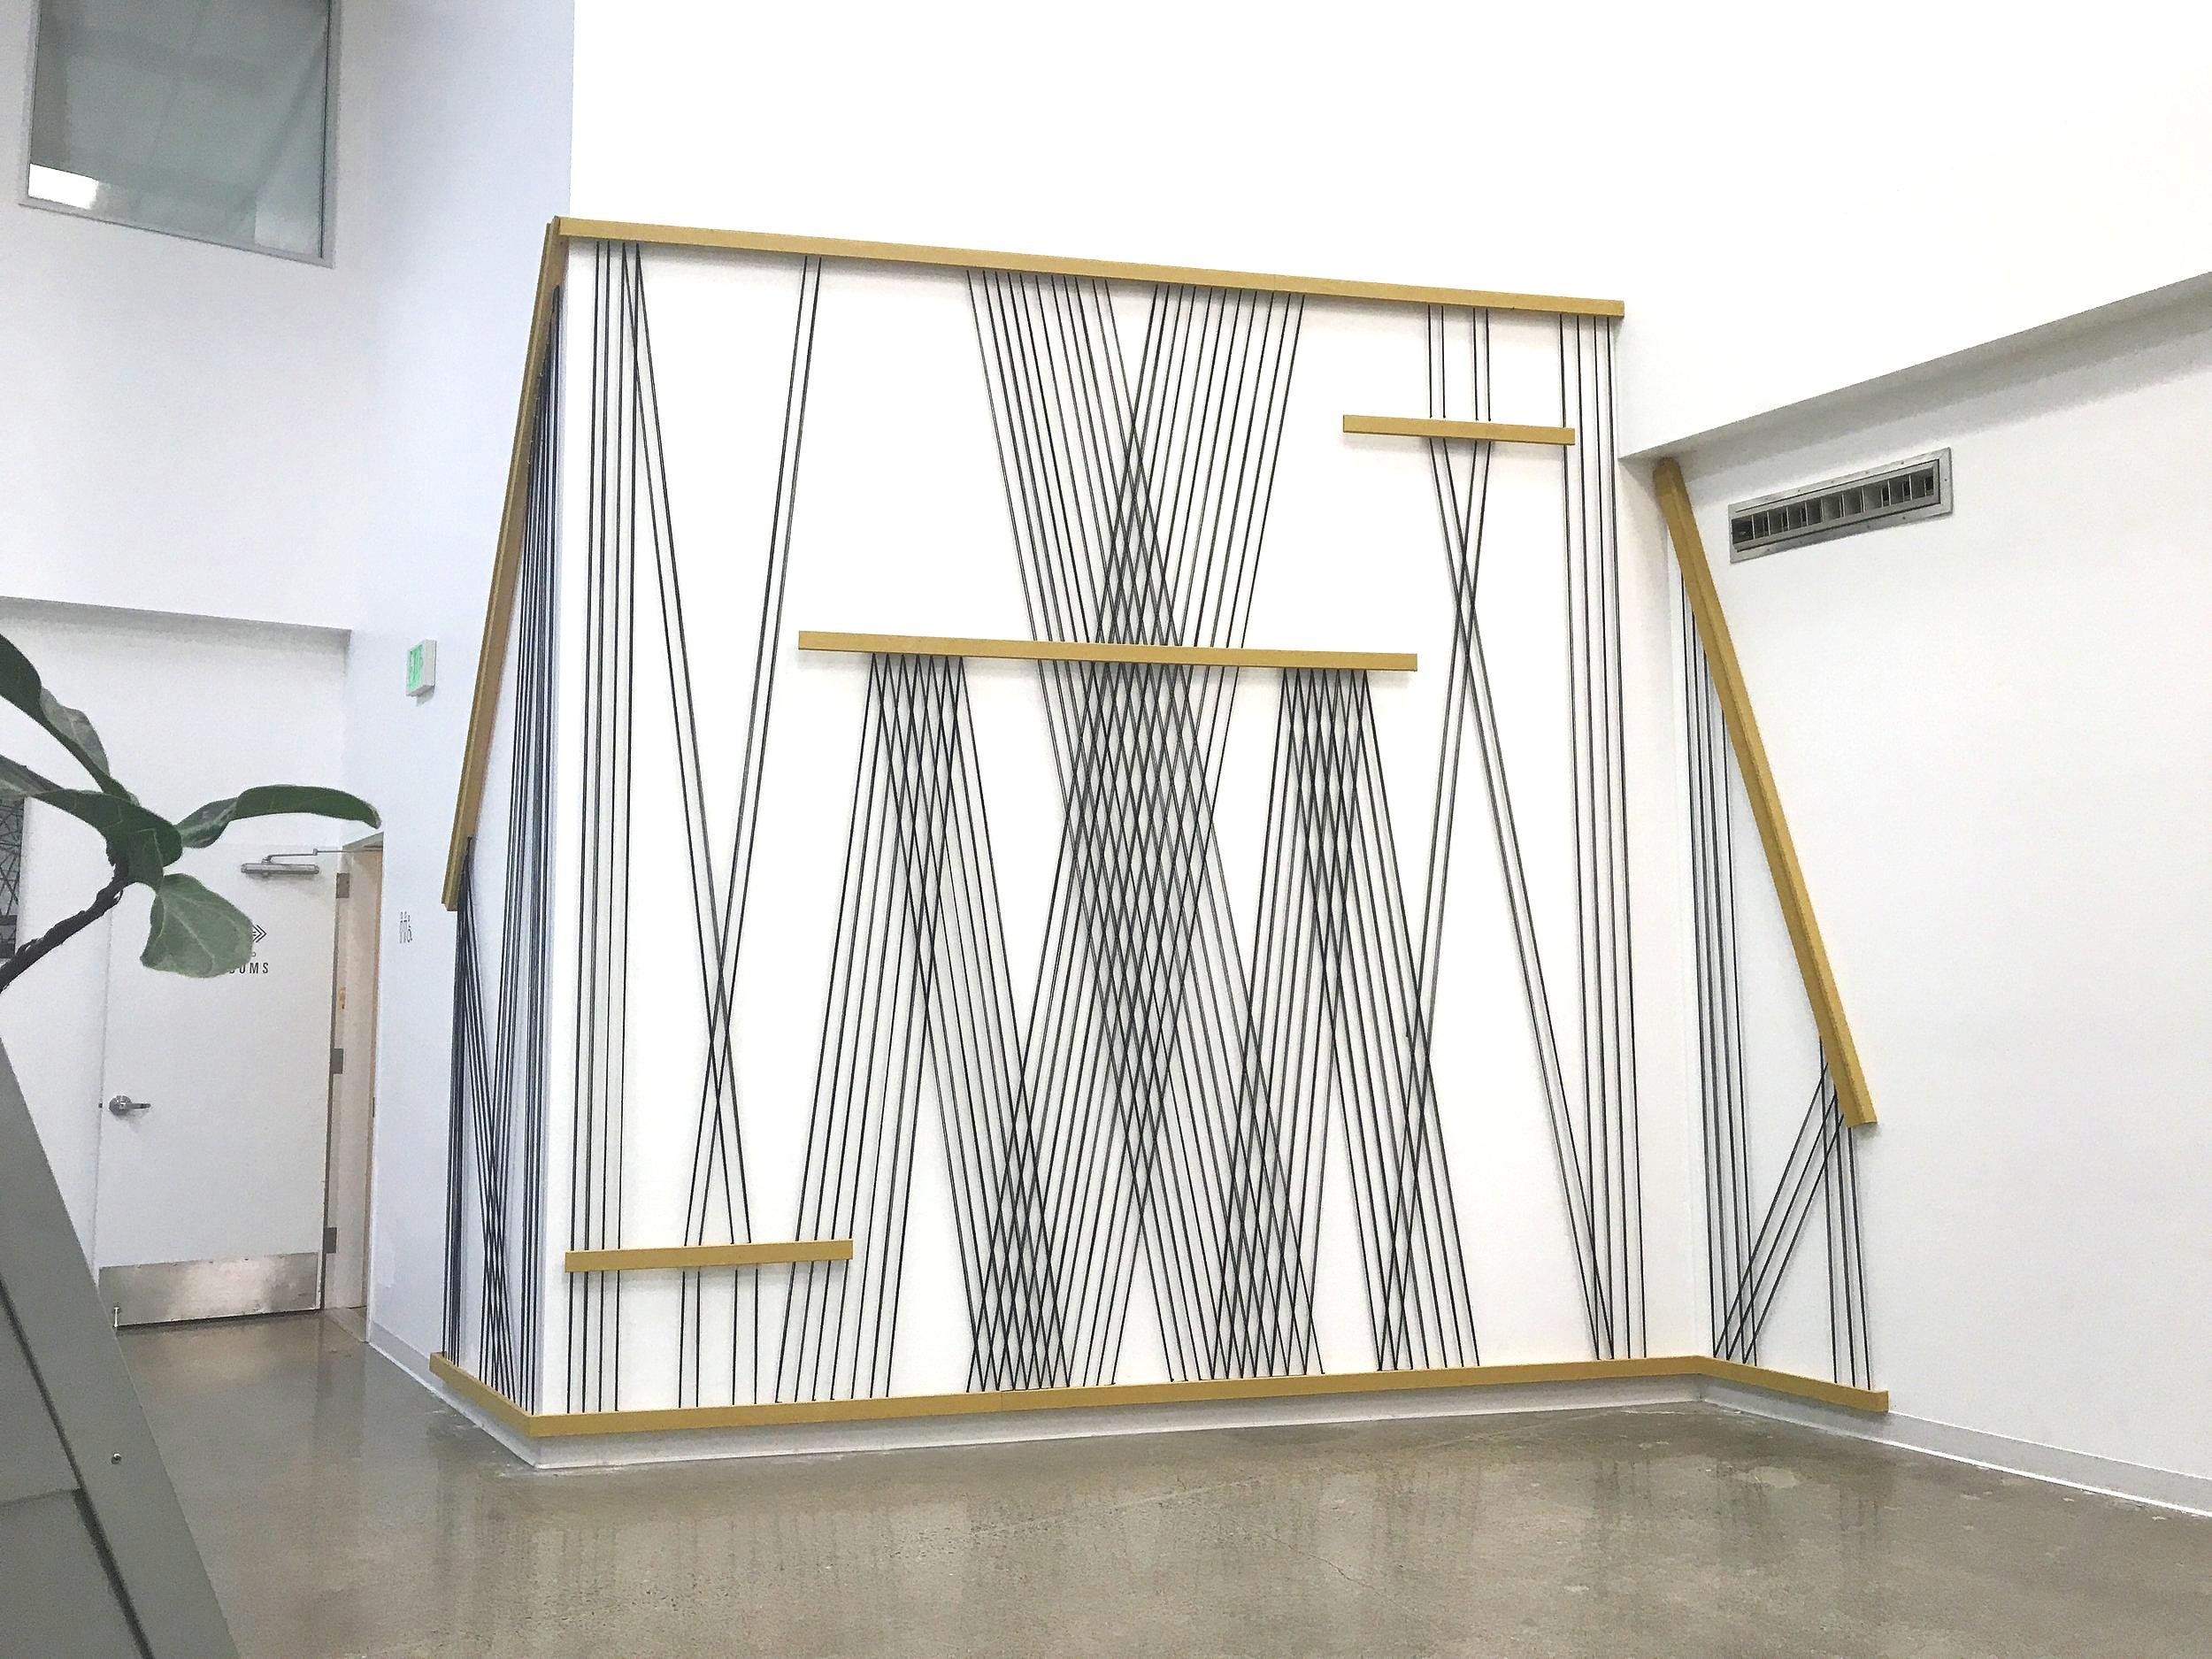 Christmas String Art | Relevant + Raw Installation | @RelevantRaw